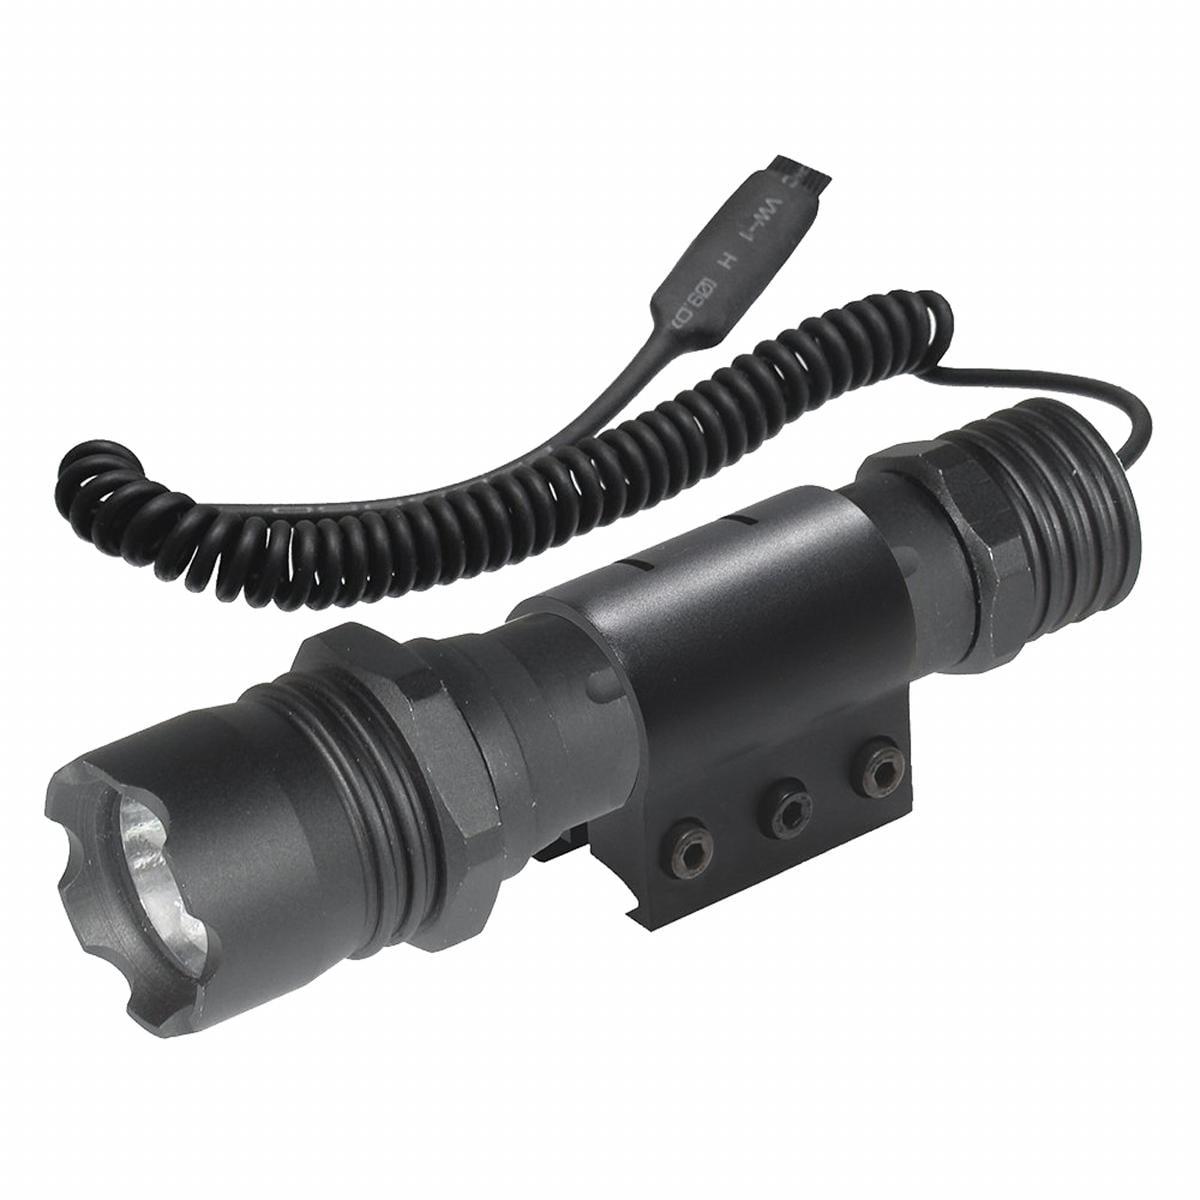 Leapers Inc. 126 Lumen Xenon Light; Handheld or Ring (126 Lm Xenon Light; Handheld or Ring)